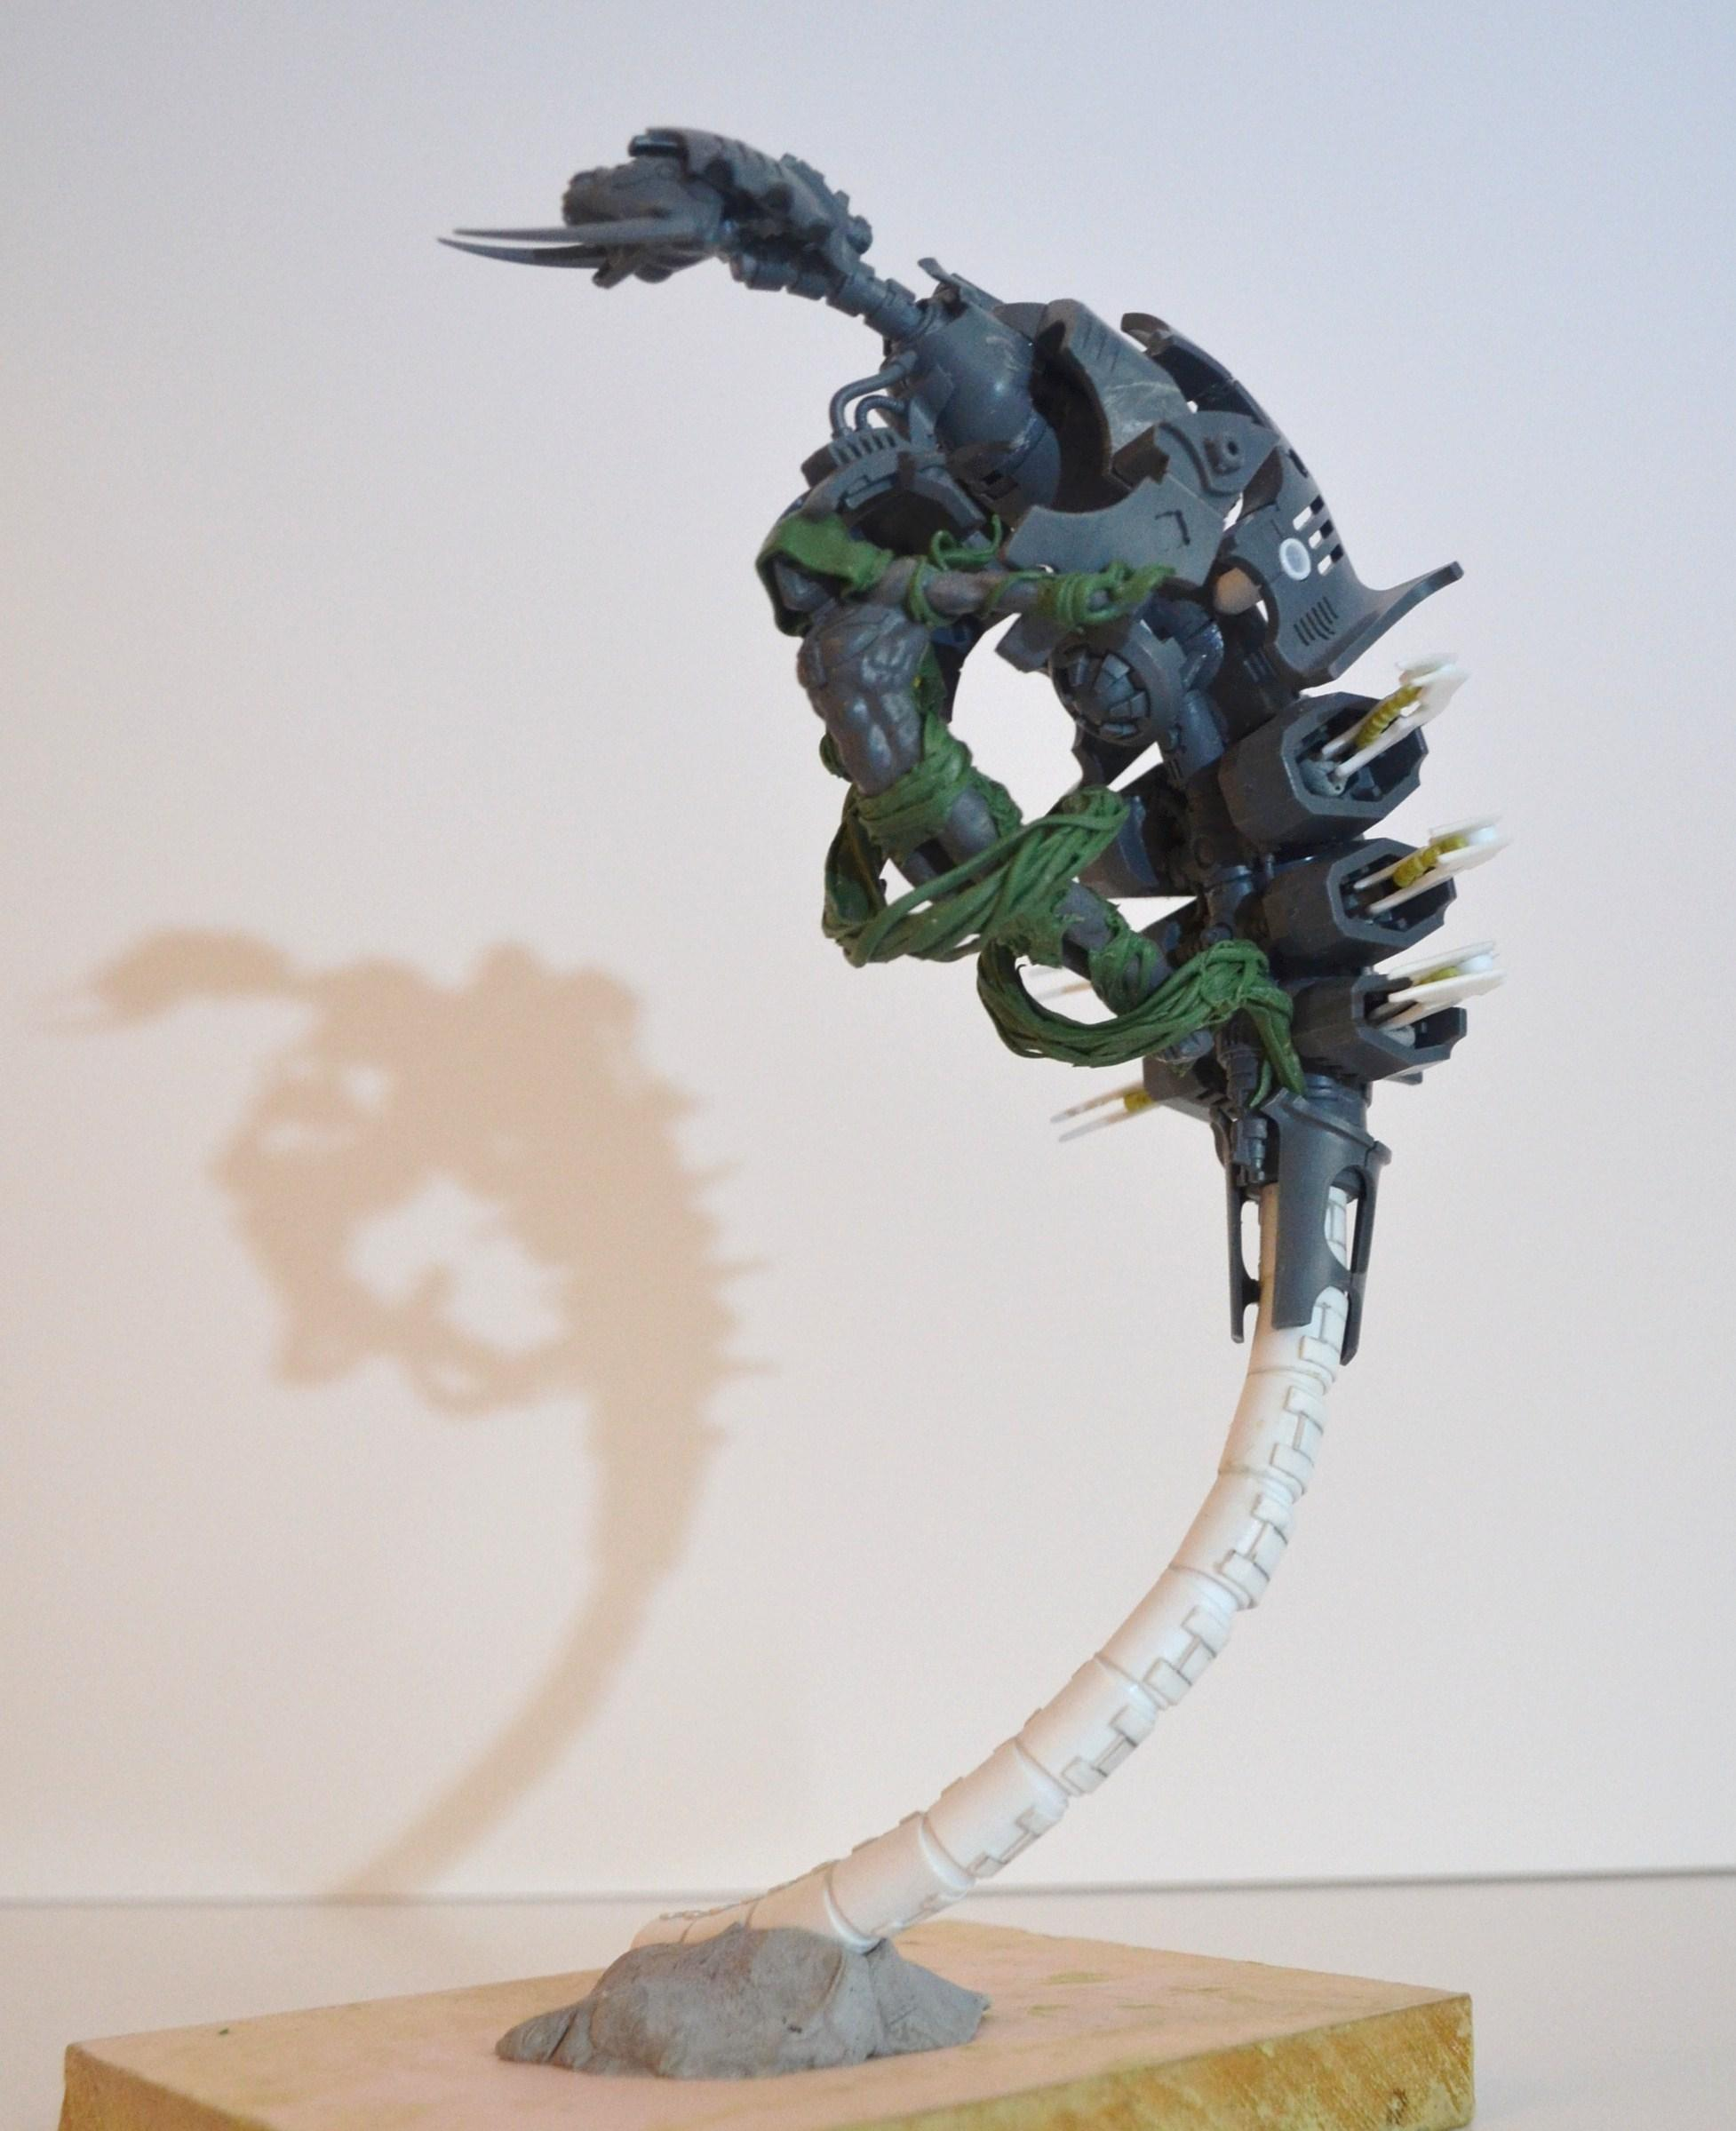 C'tan, Canoptek, Conversion, Guardians, Leach, Monolith, Necrons, Nightbringer, Pyramid, Sculpting, Tesseract Vault, Warhammer 40,000, Warhammer Fantasy